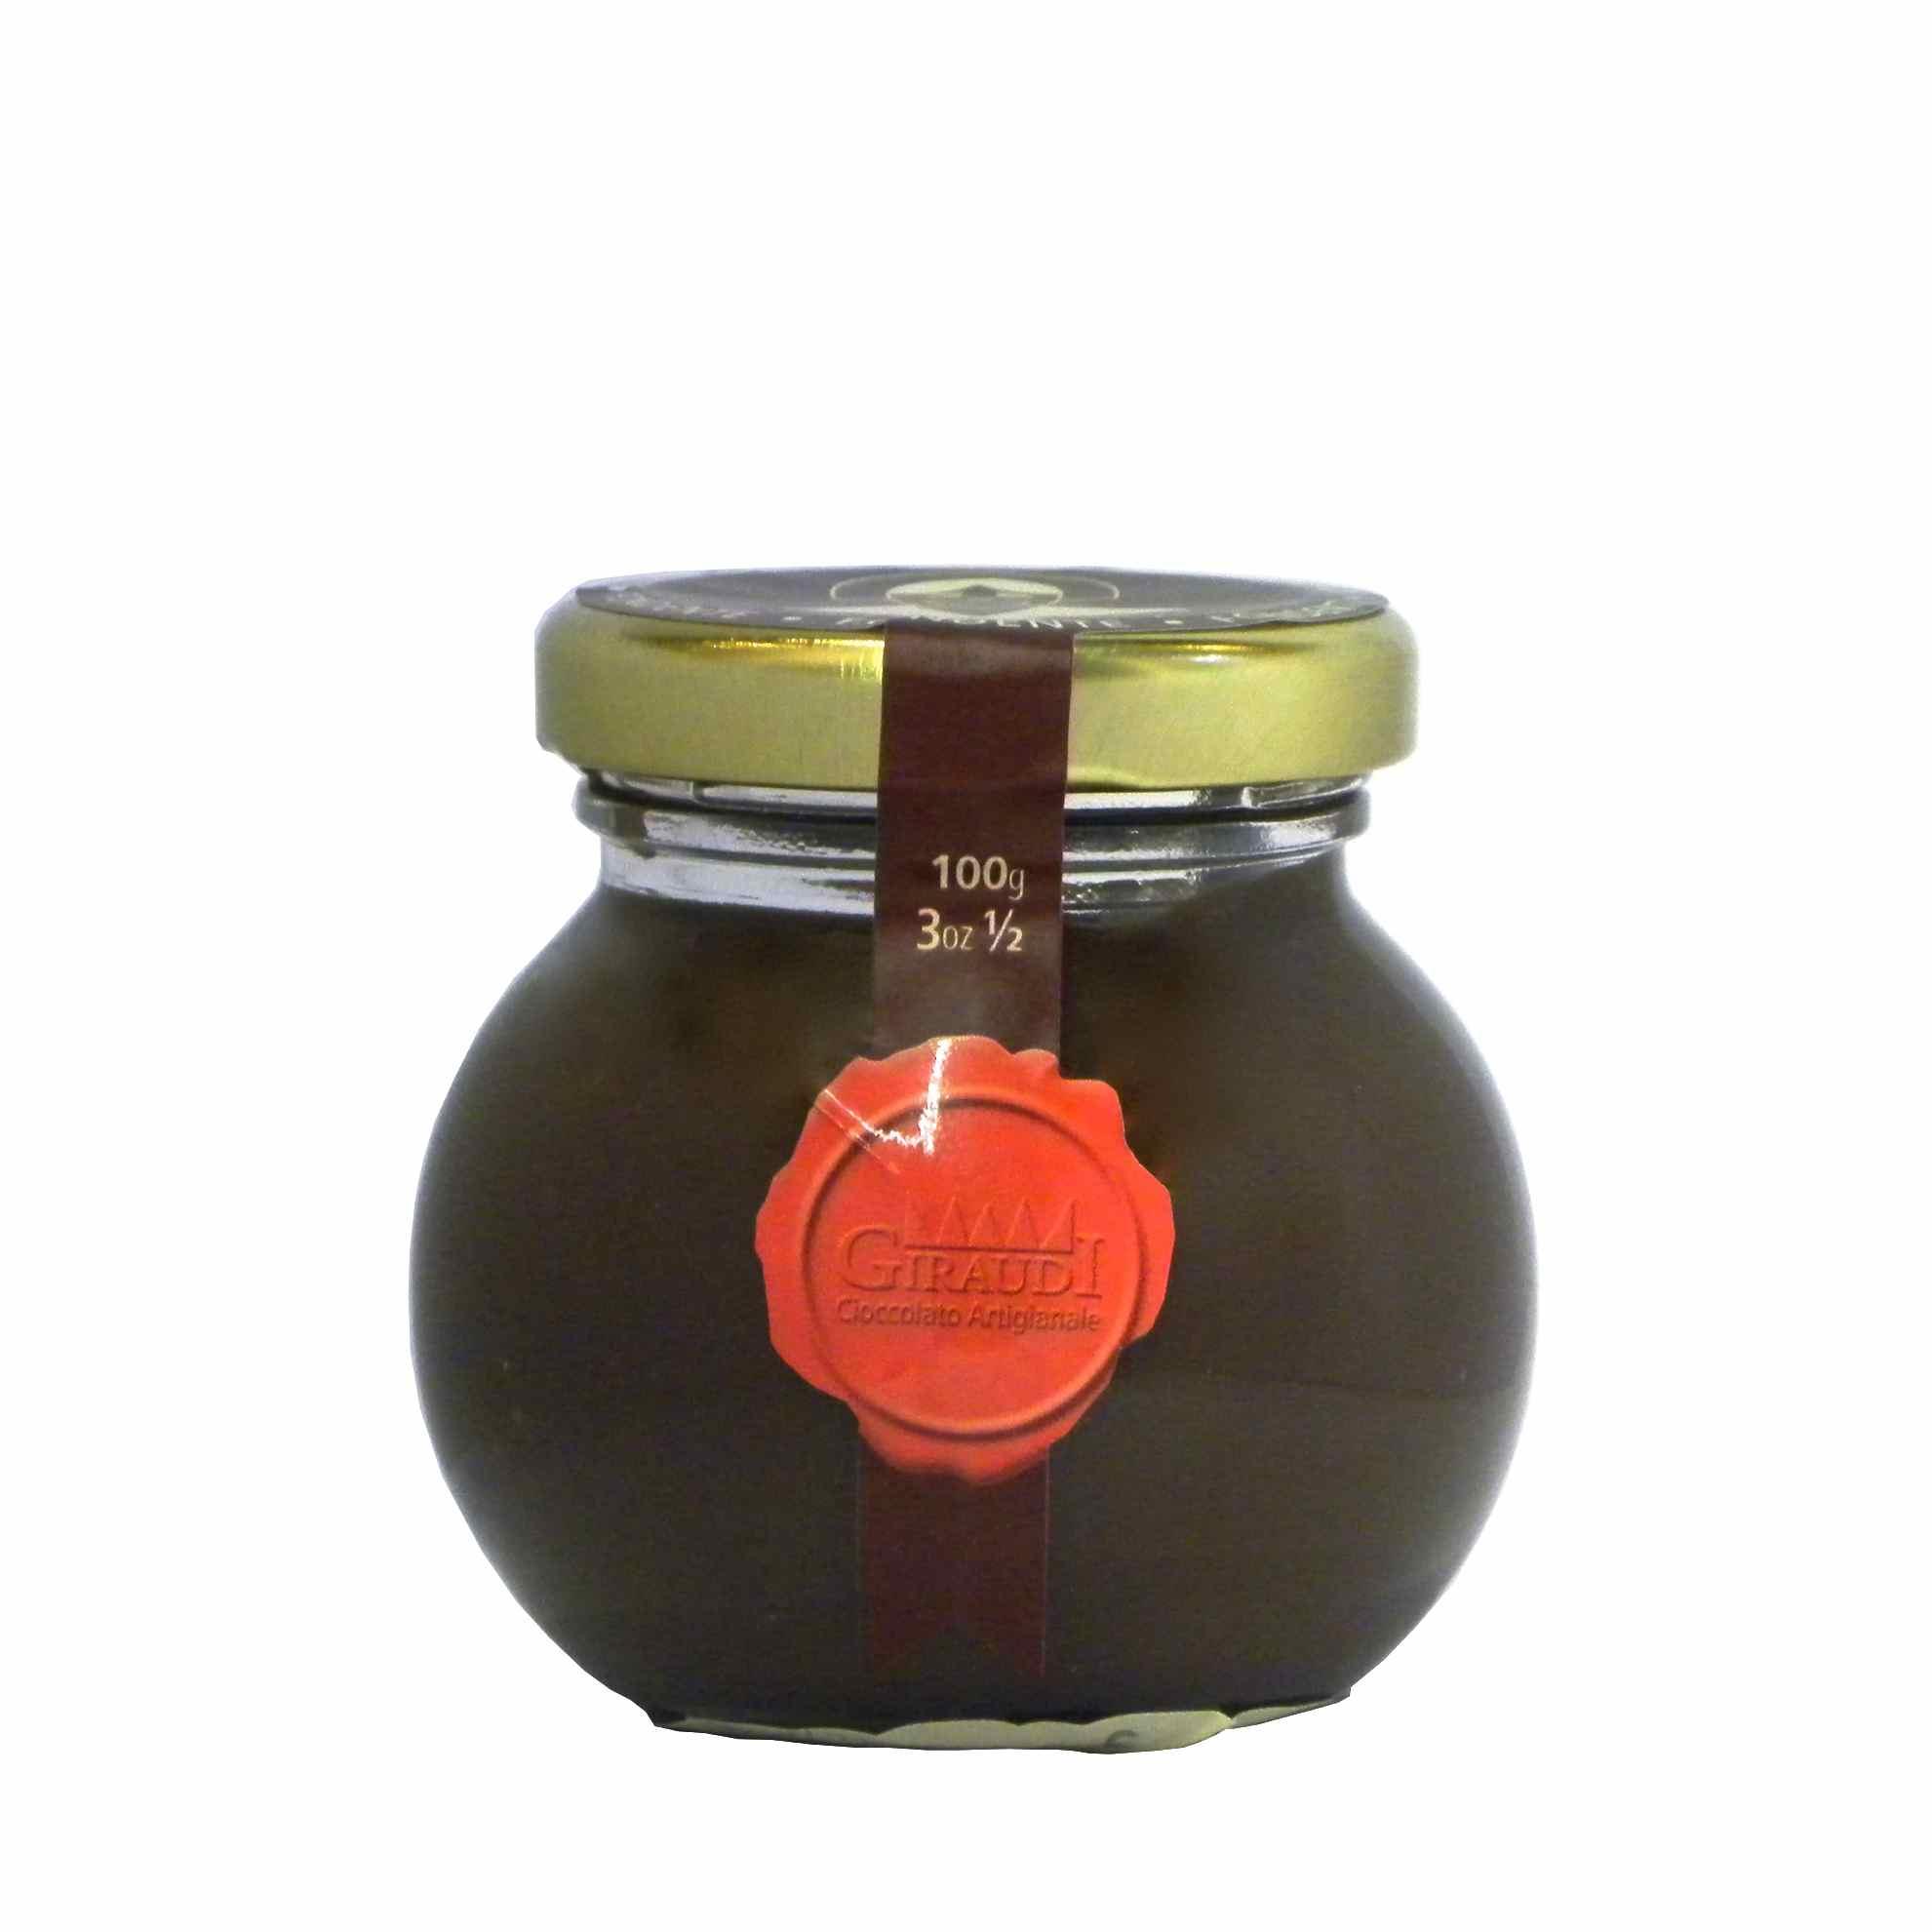 Giraudi Giacometta fondente 100 g – Giraudi dark Giacometta 100 g – Gustorotondo – Italian food boutique – Versione 2